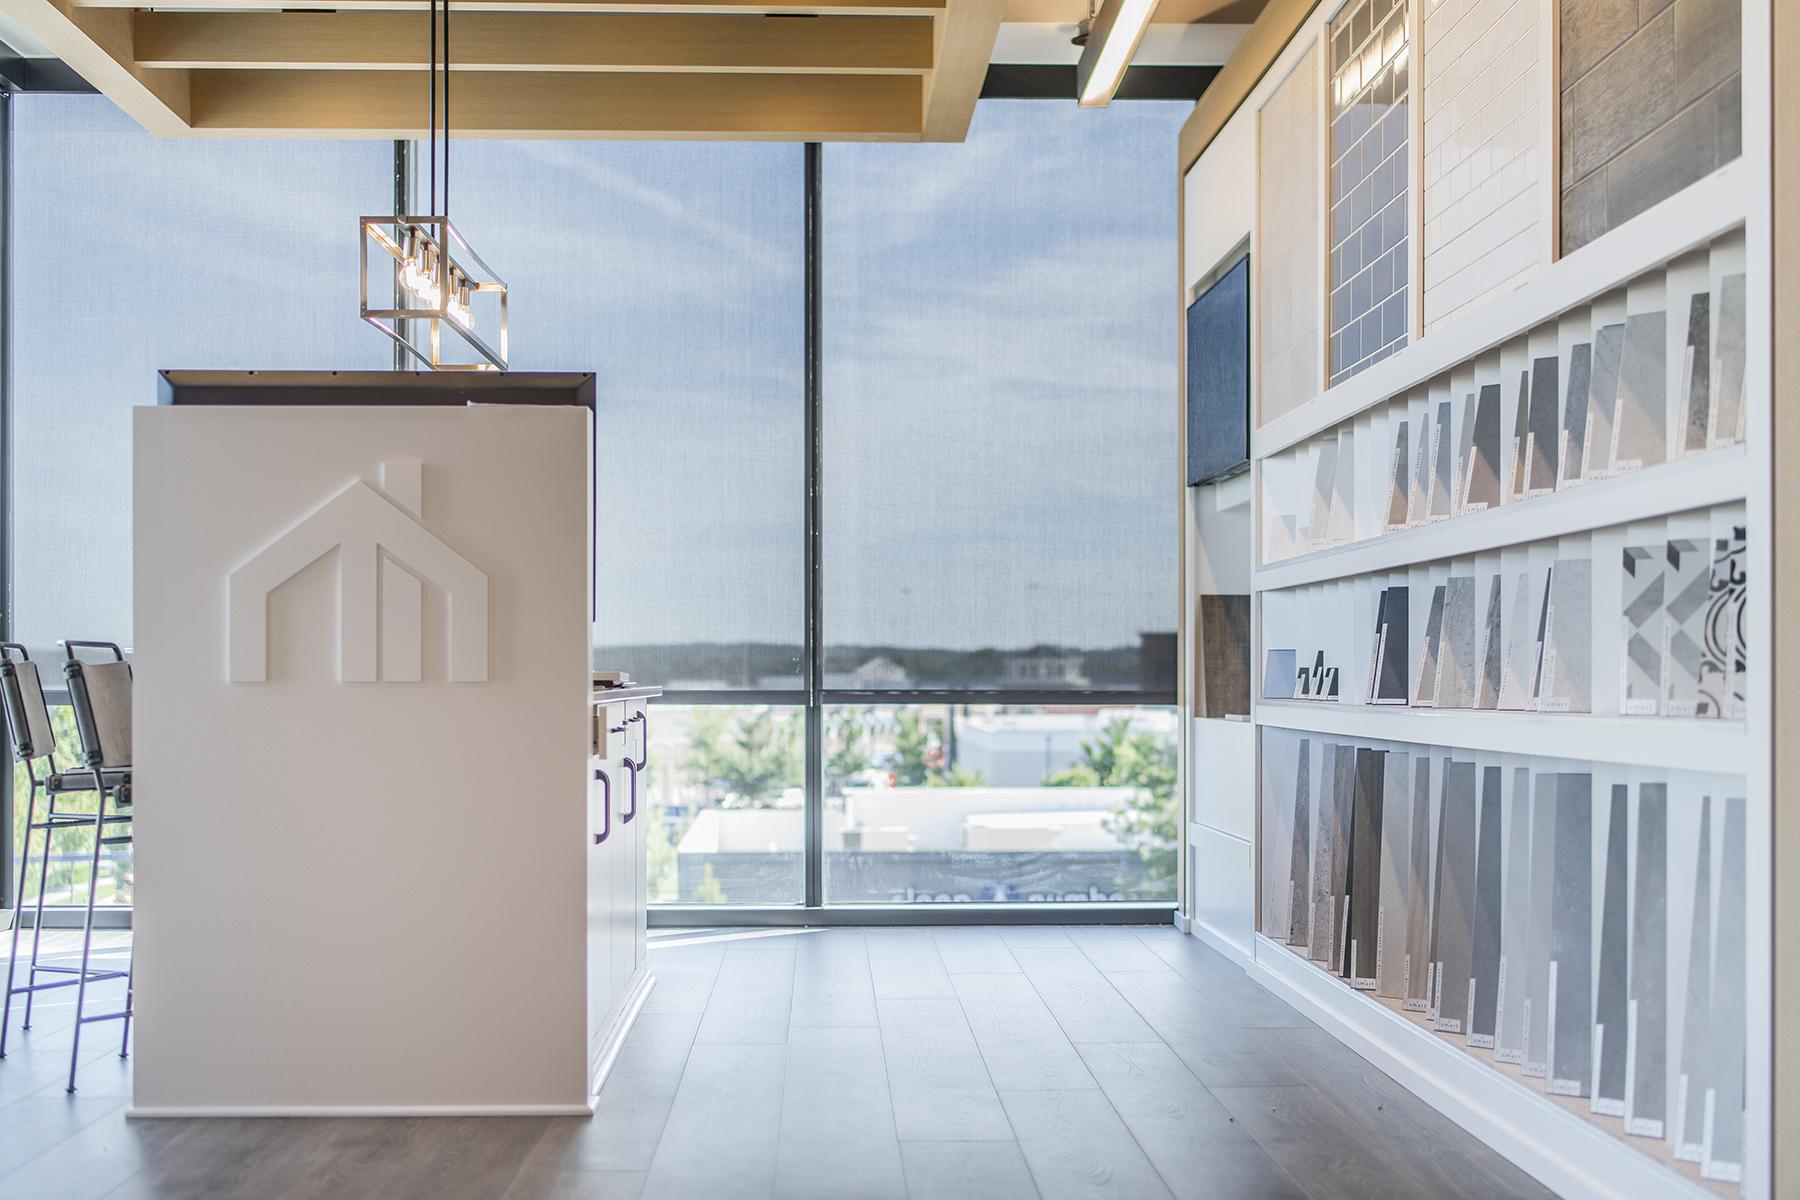 Take a Peek Inside Our Brand New Design Studio in Columbus, Ohio